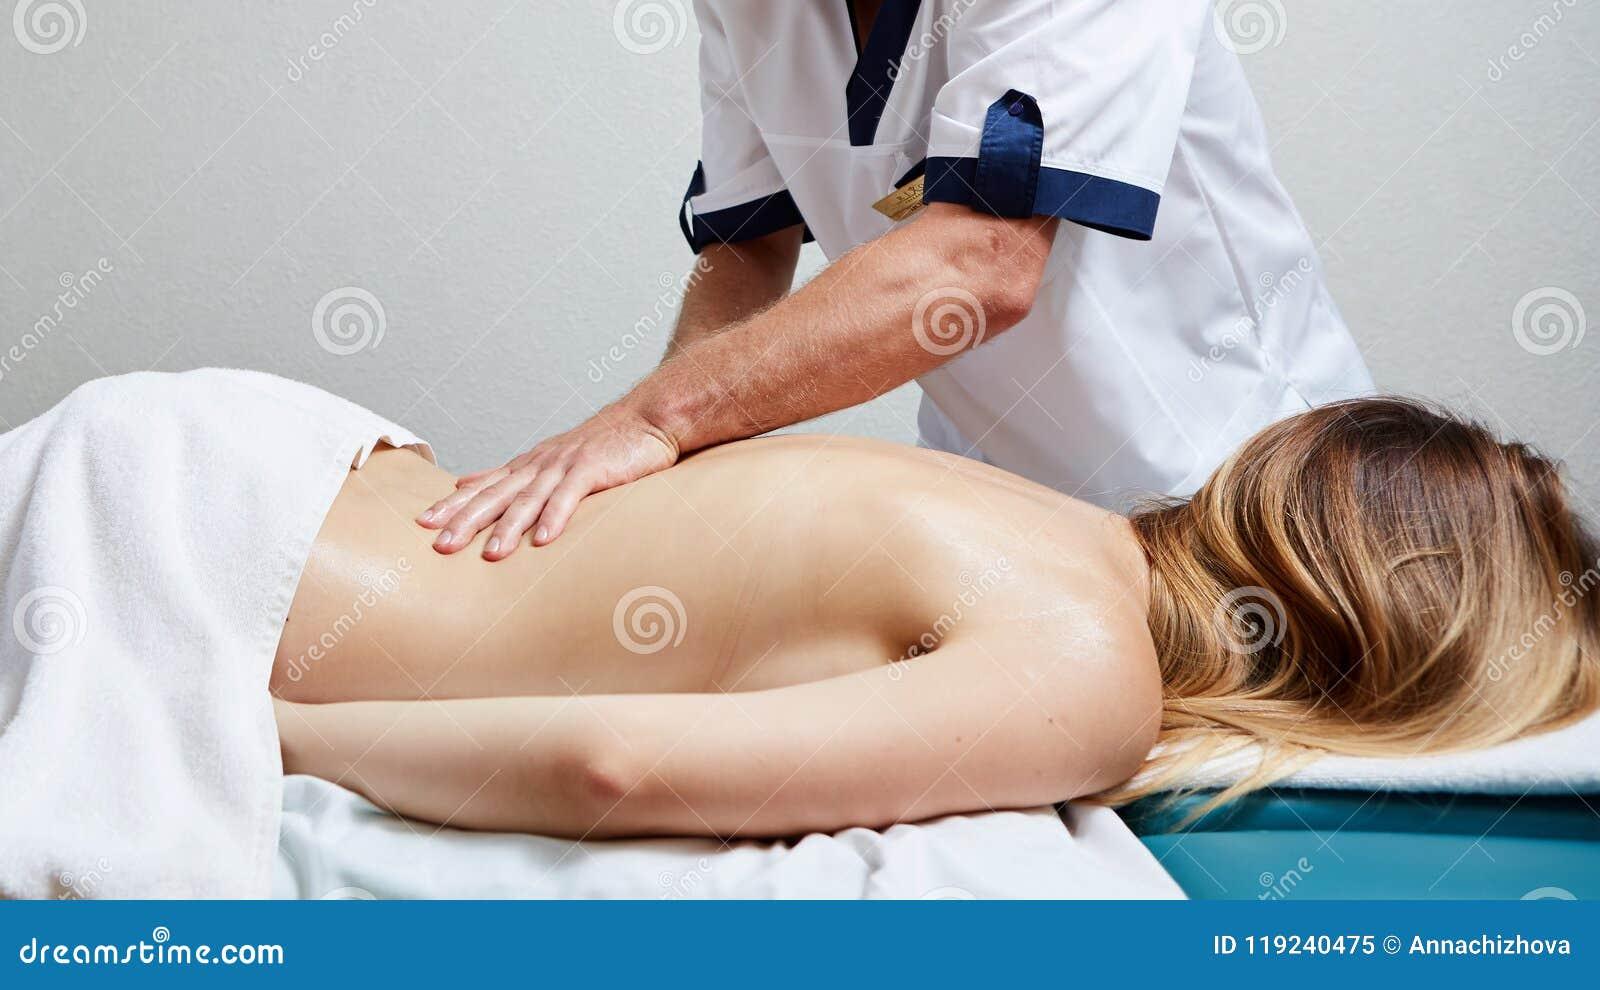 negozi sex video massaggi a donne